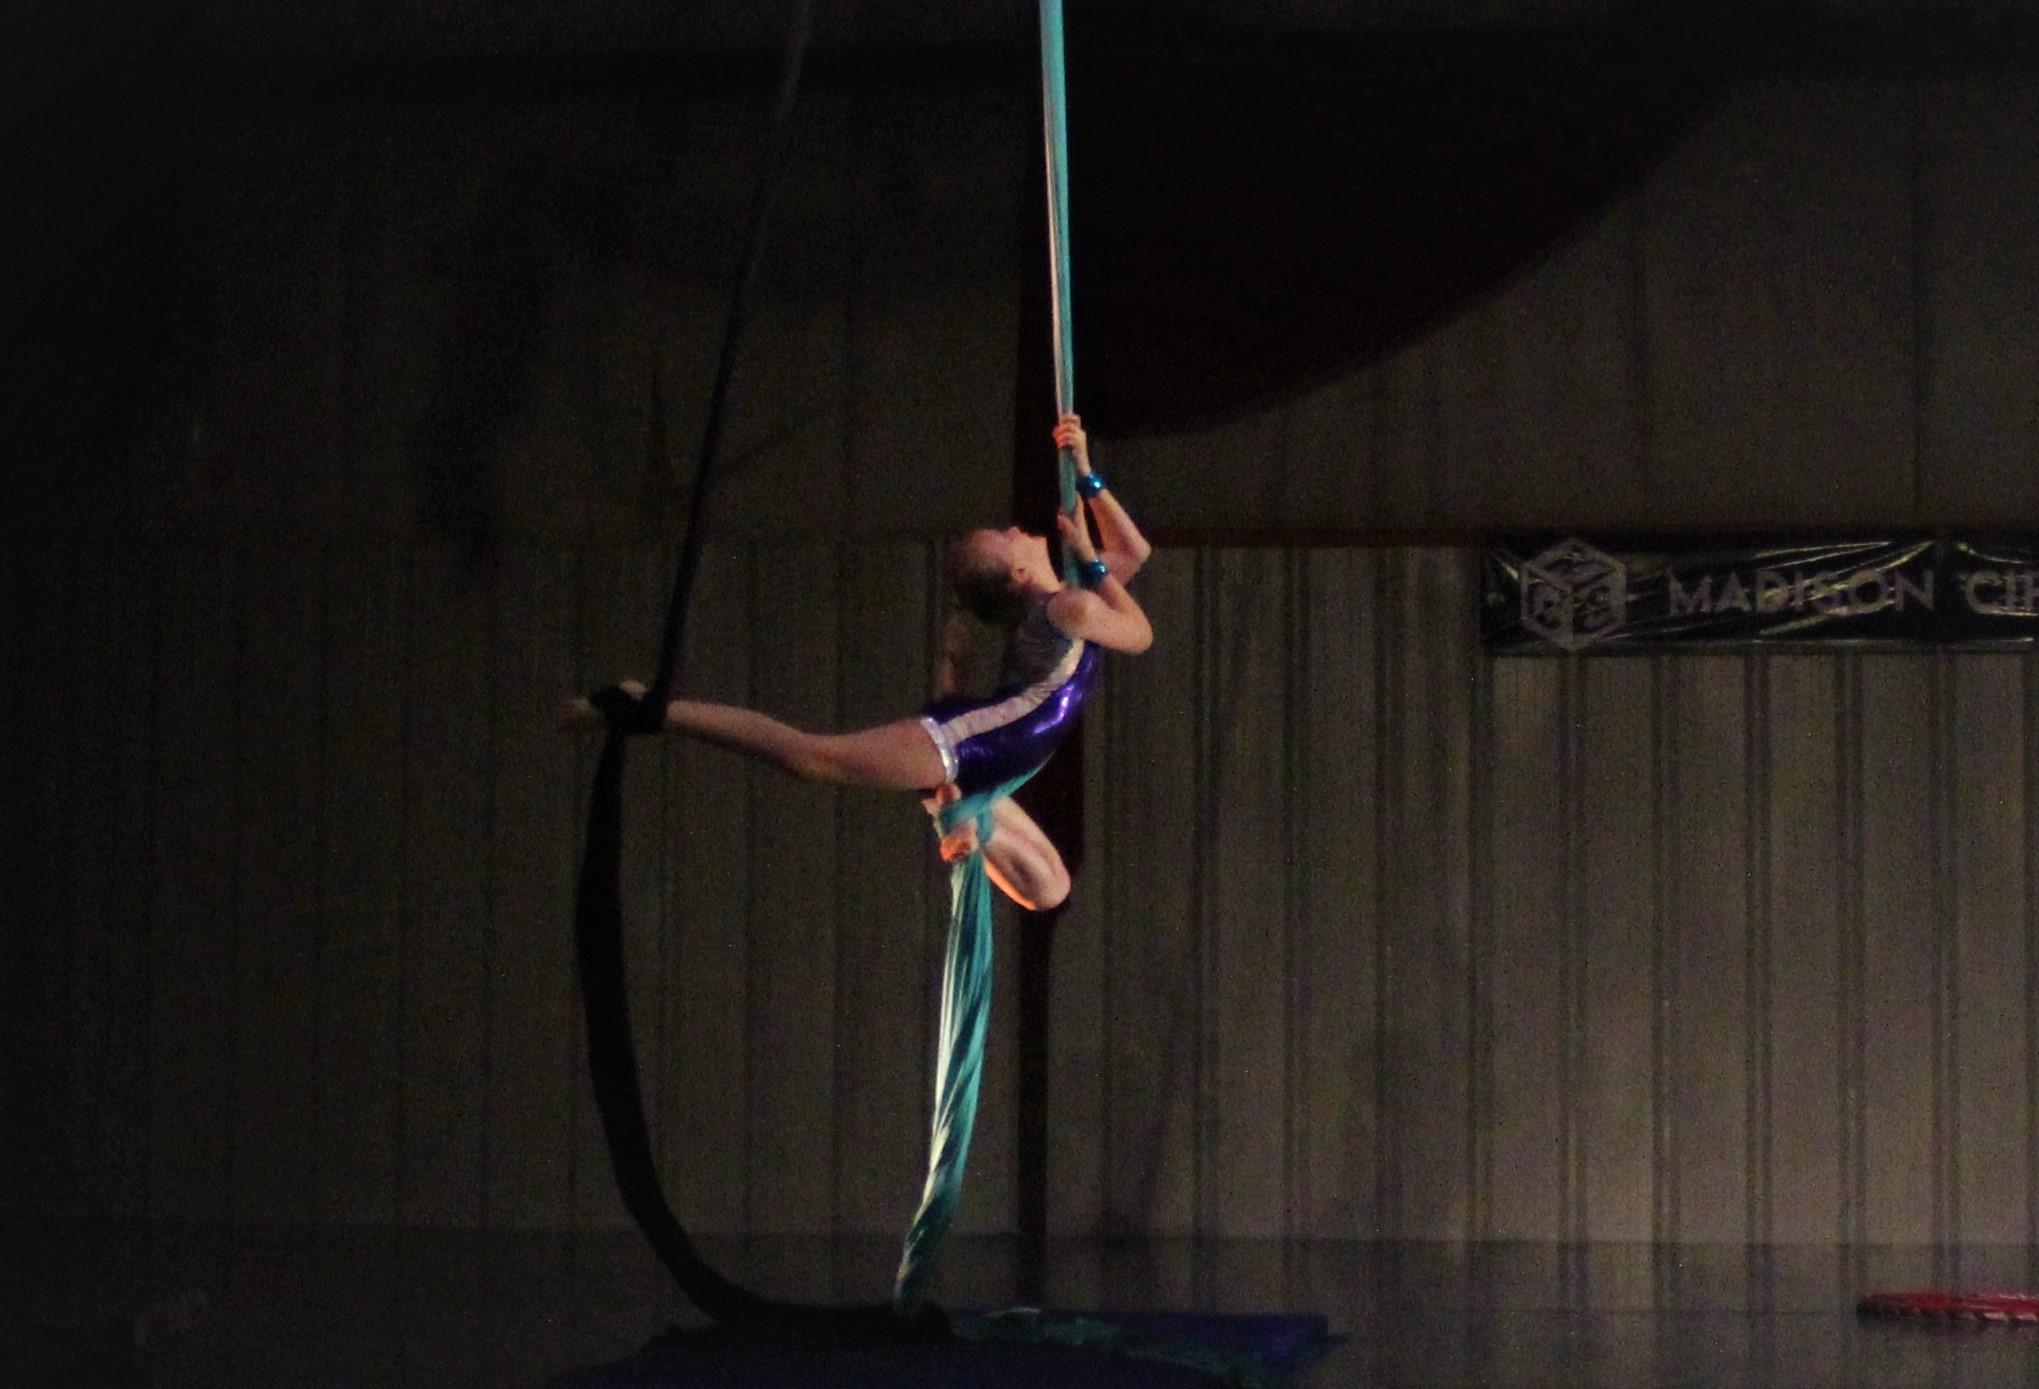 jess aerial dance 3.jpg